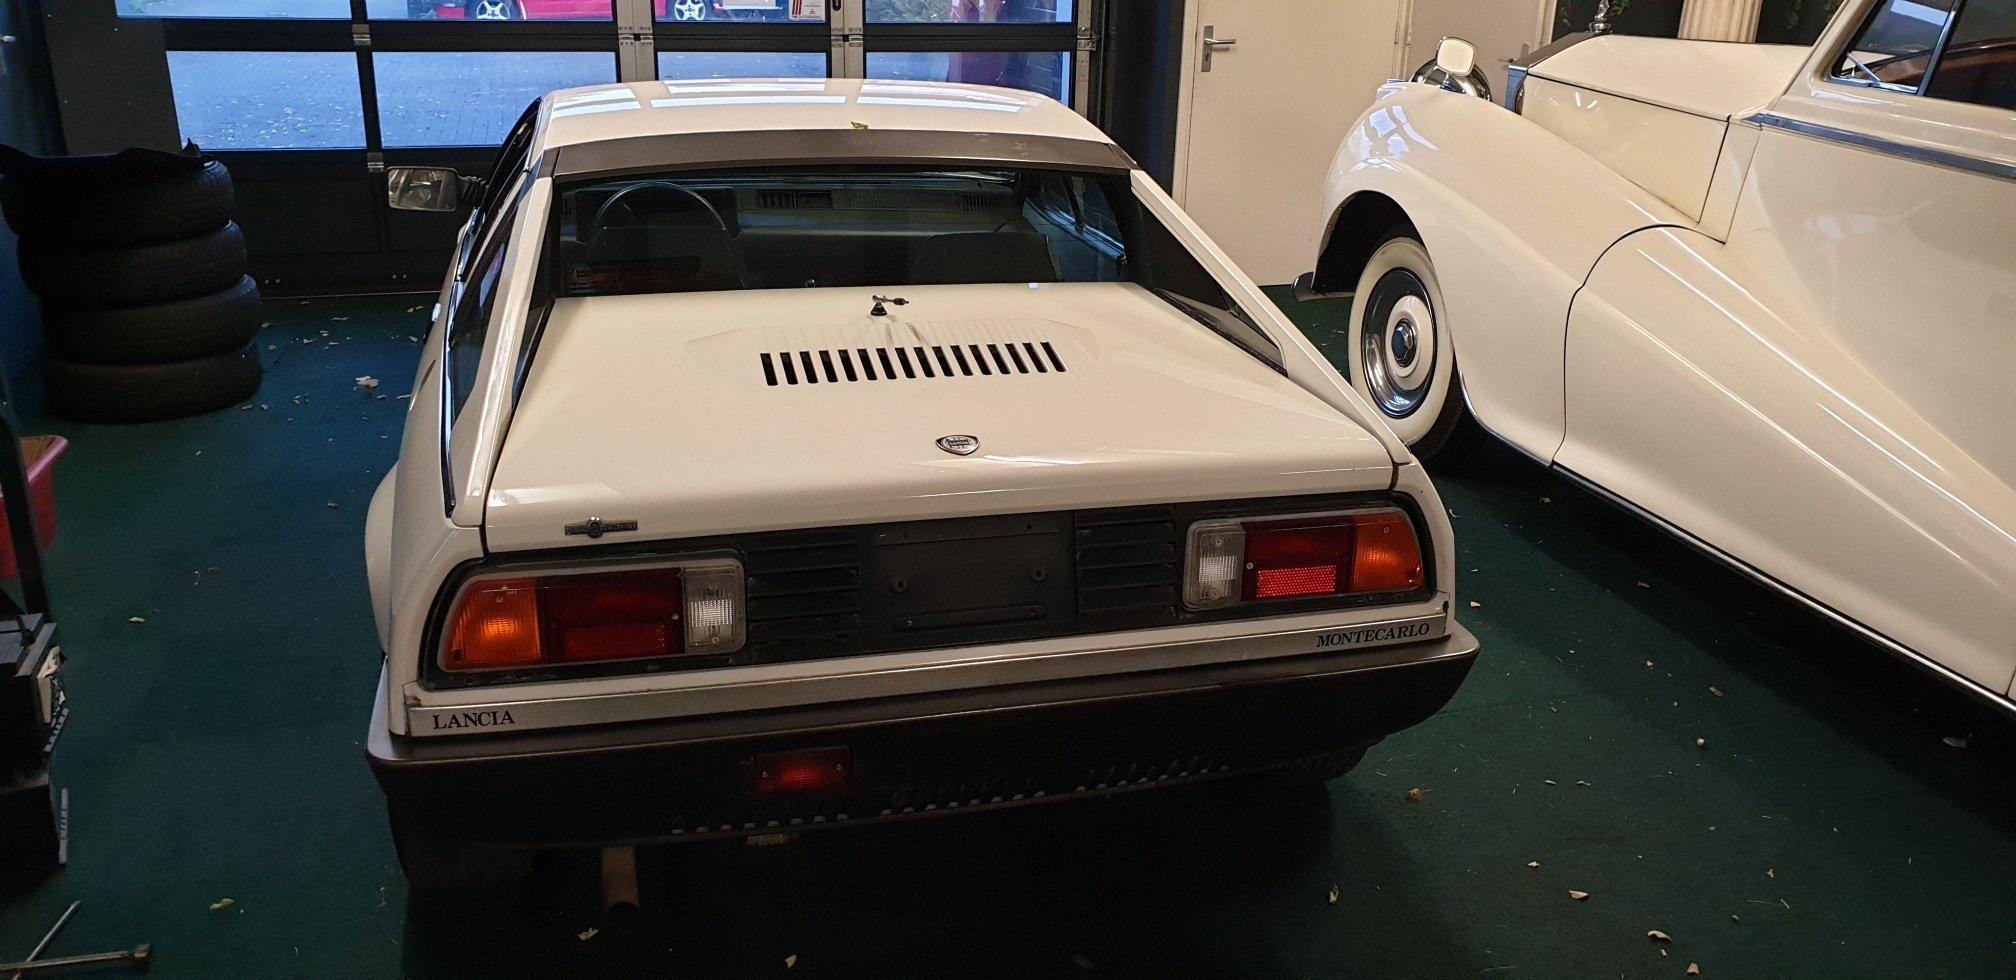 Lancia Beta Monte Carlo Coupe 1982 For Sale (picture 5 of 6)